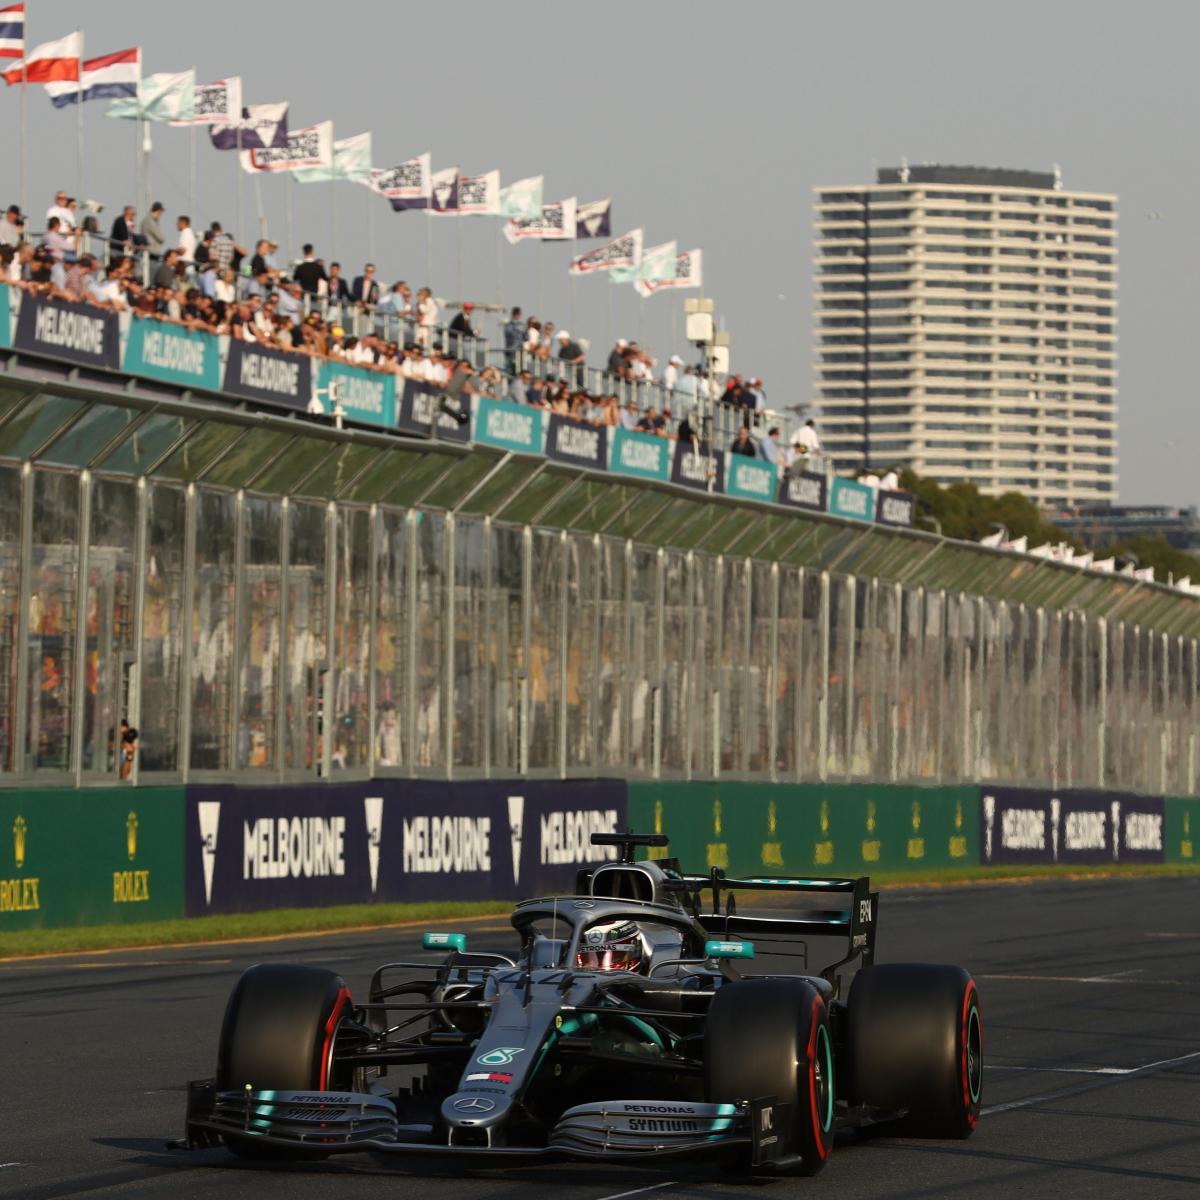 Australian F1 Grand Prix 2019 Qualifying: Saturday's